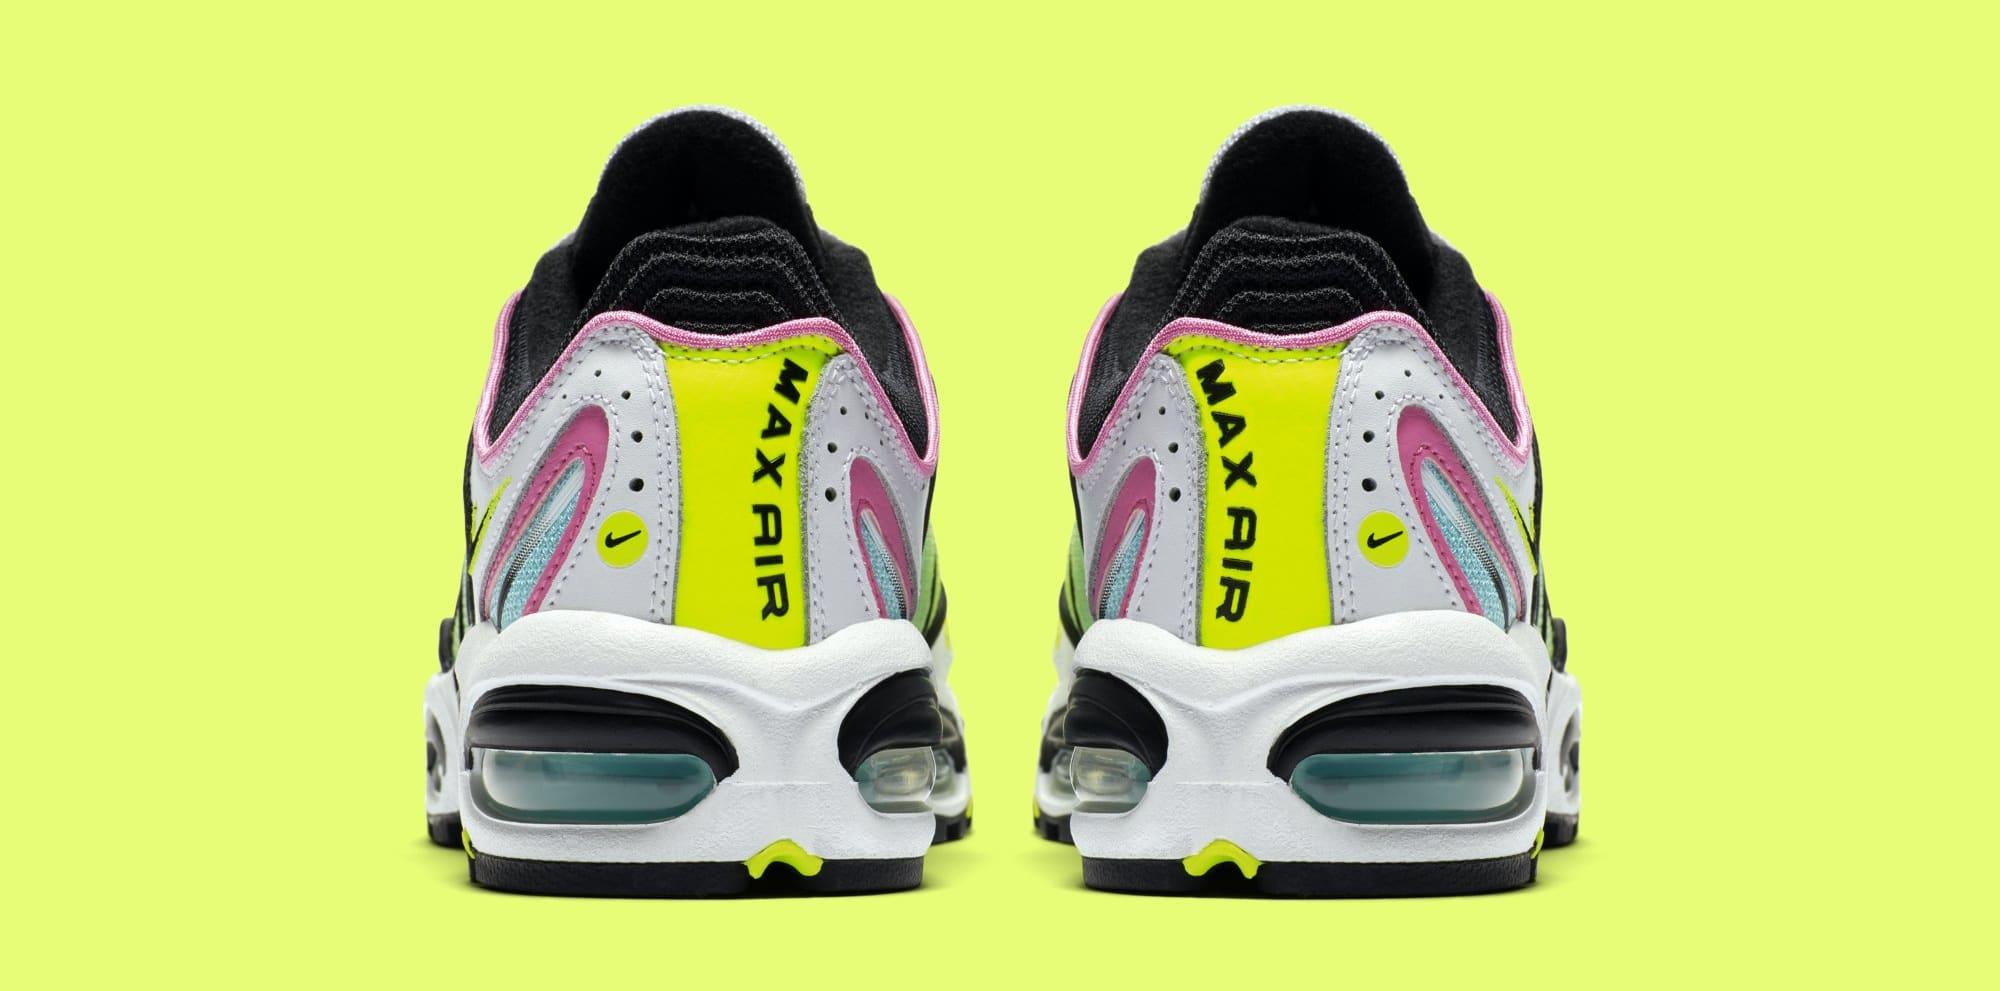 Nike Air Max Tailwind 4 AQ2567-103 (Heel)